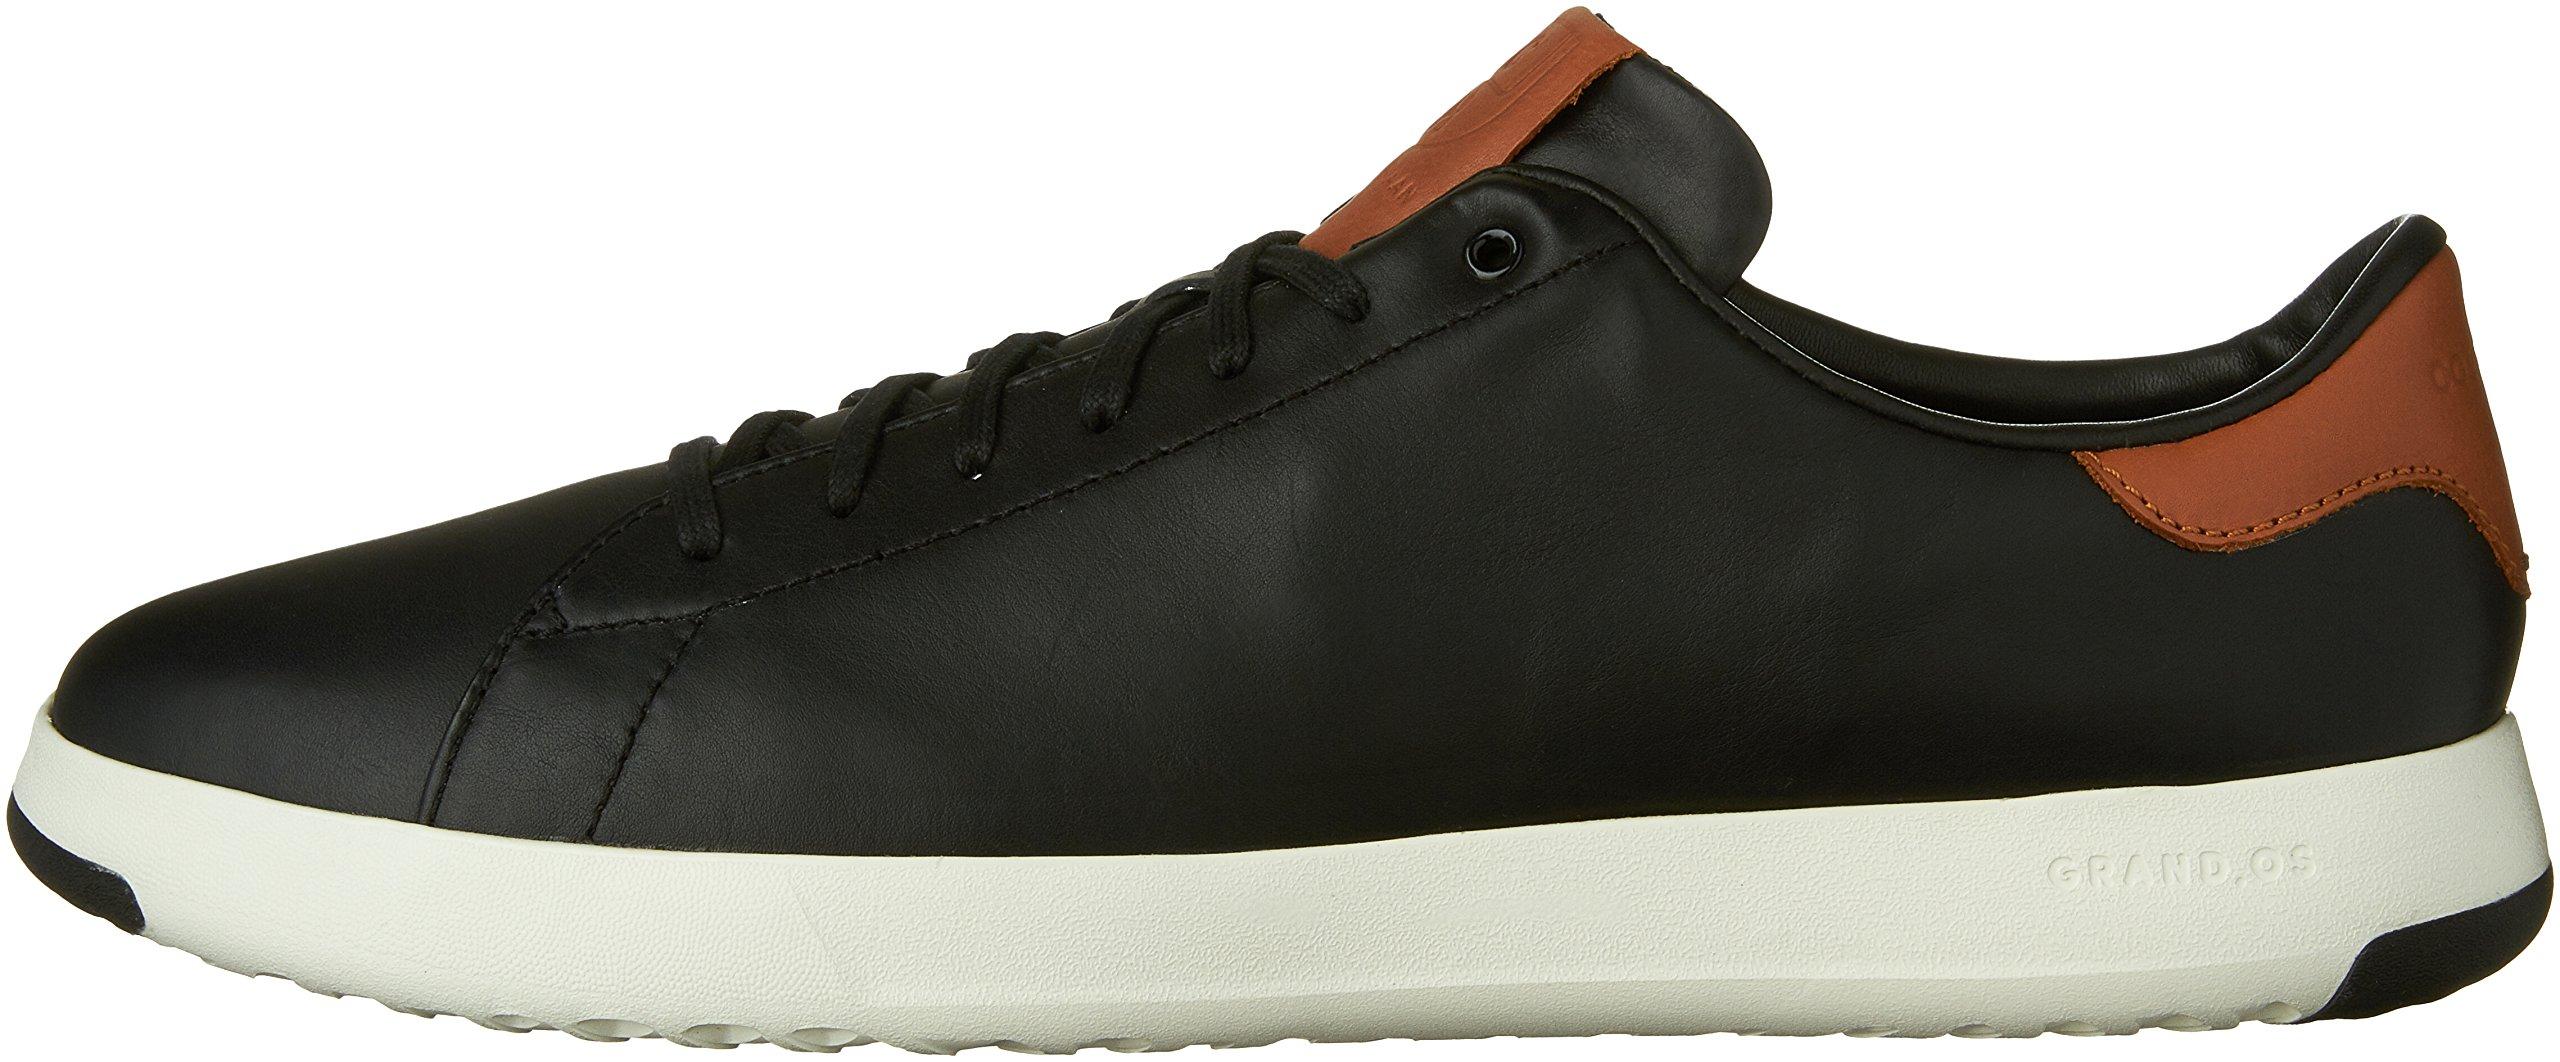 Cole Haan Men's Grandpro Tennis Fashion Sneaker, Black/British Tan, 7 M US by Cole Haan (Image #5)